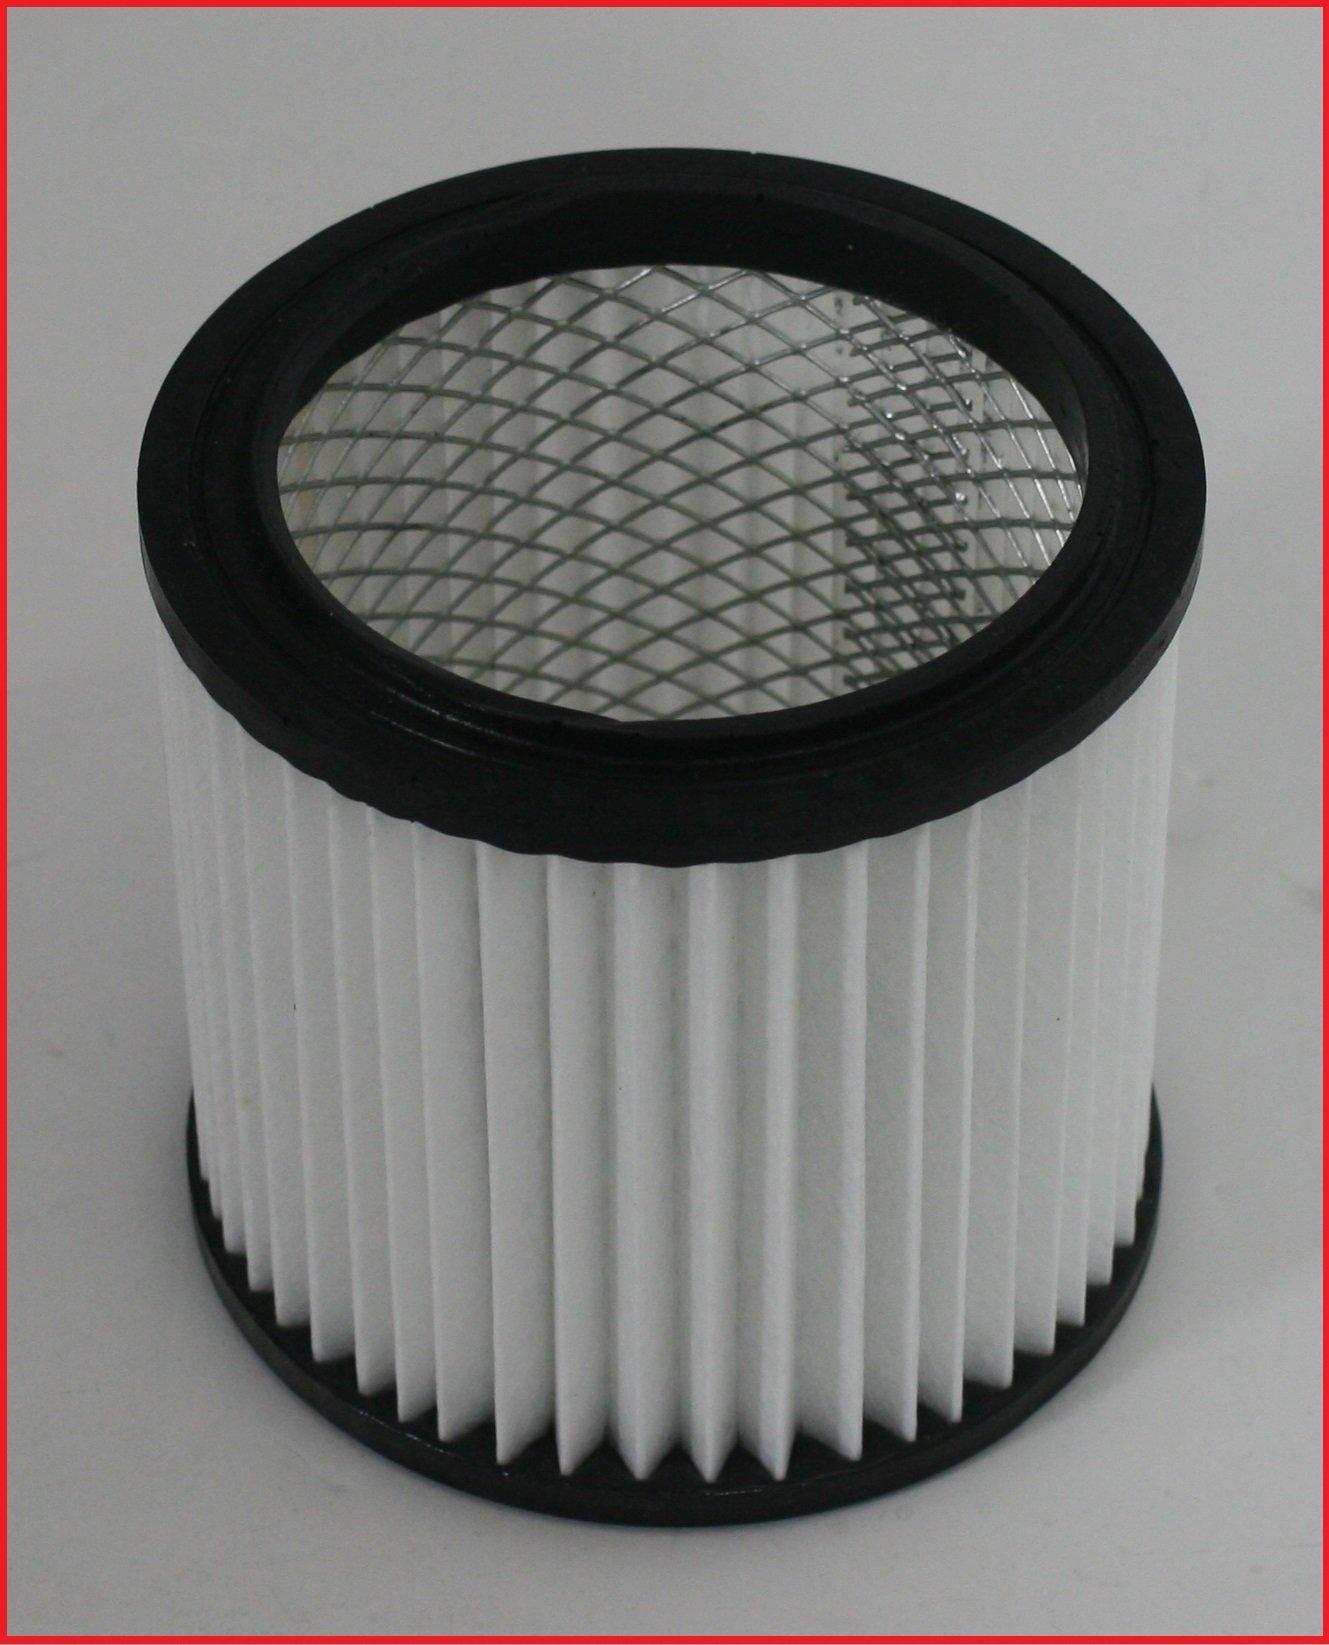 Parkside LIDL PAS 500 A1 IAN 53462 - Filtro para aspirador de cenizas (con pliegues): Amazon.es: Hogar